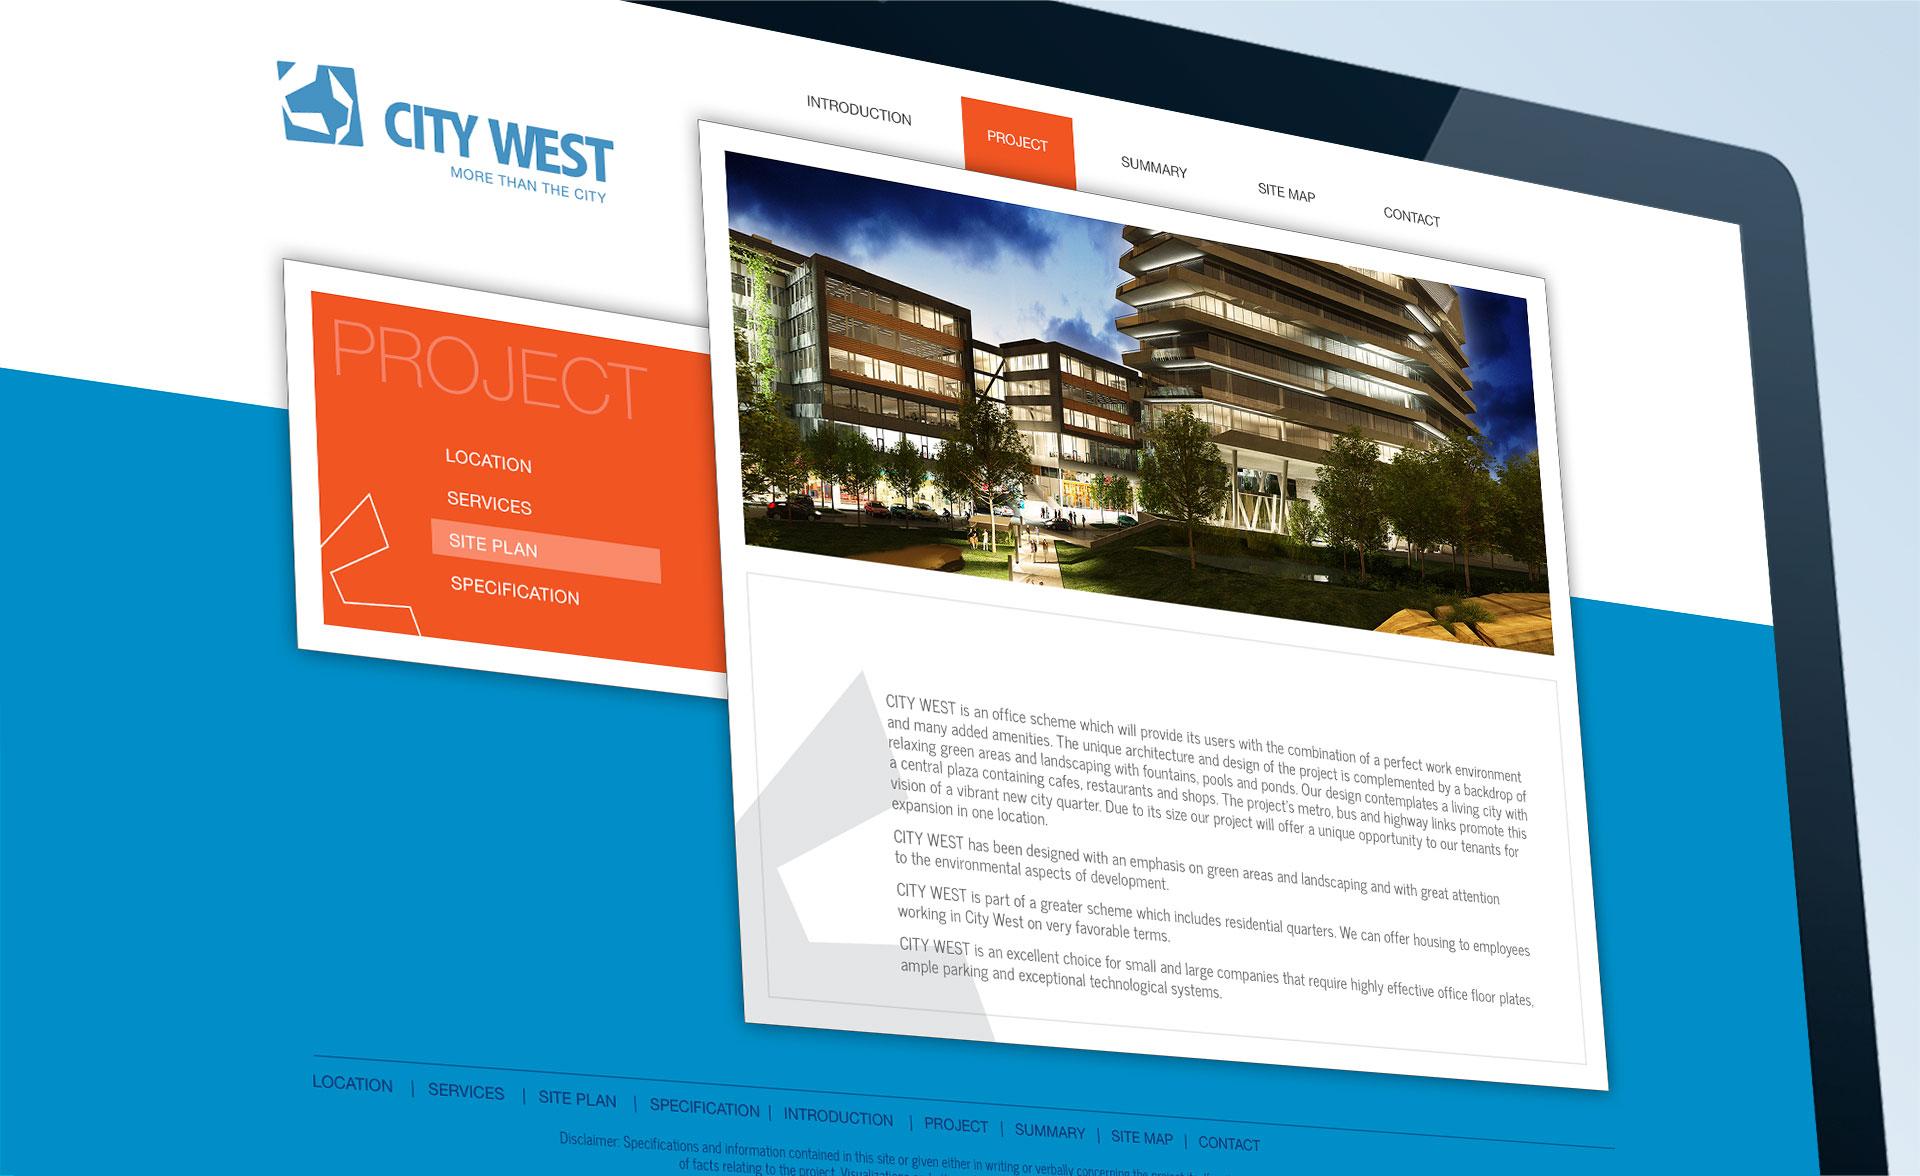 citywest_03